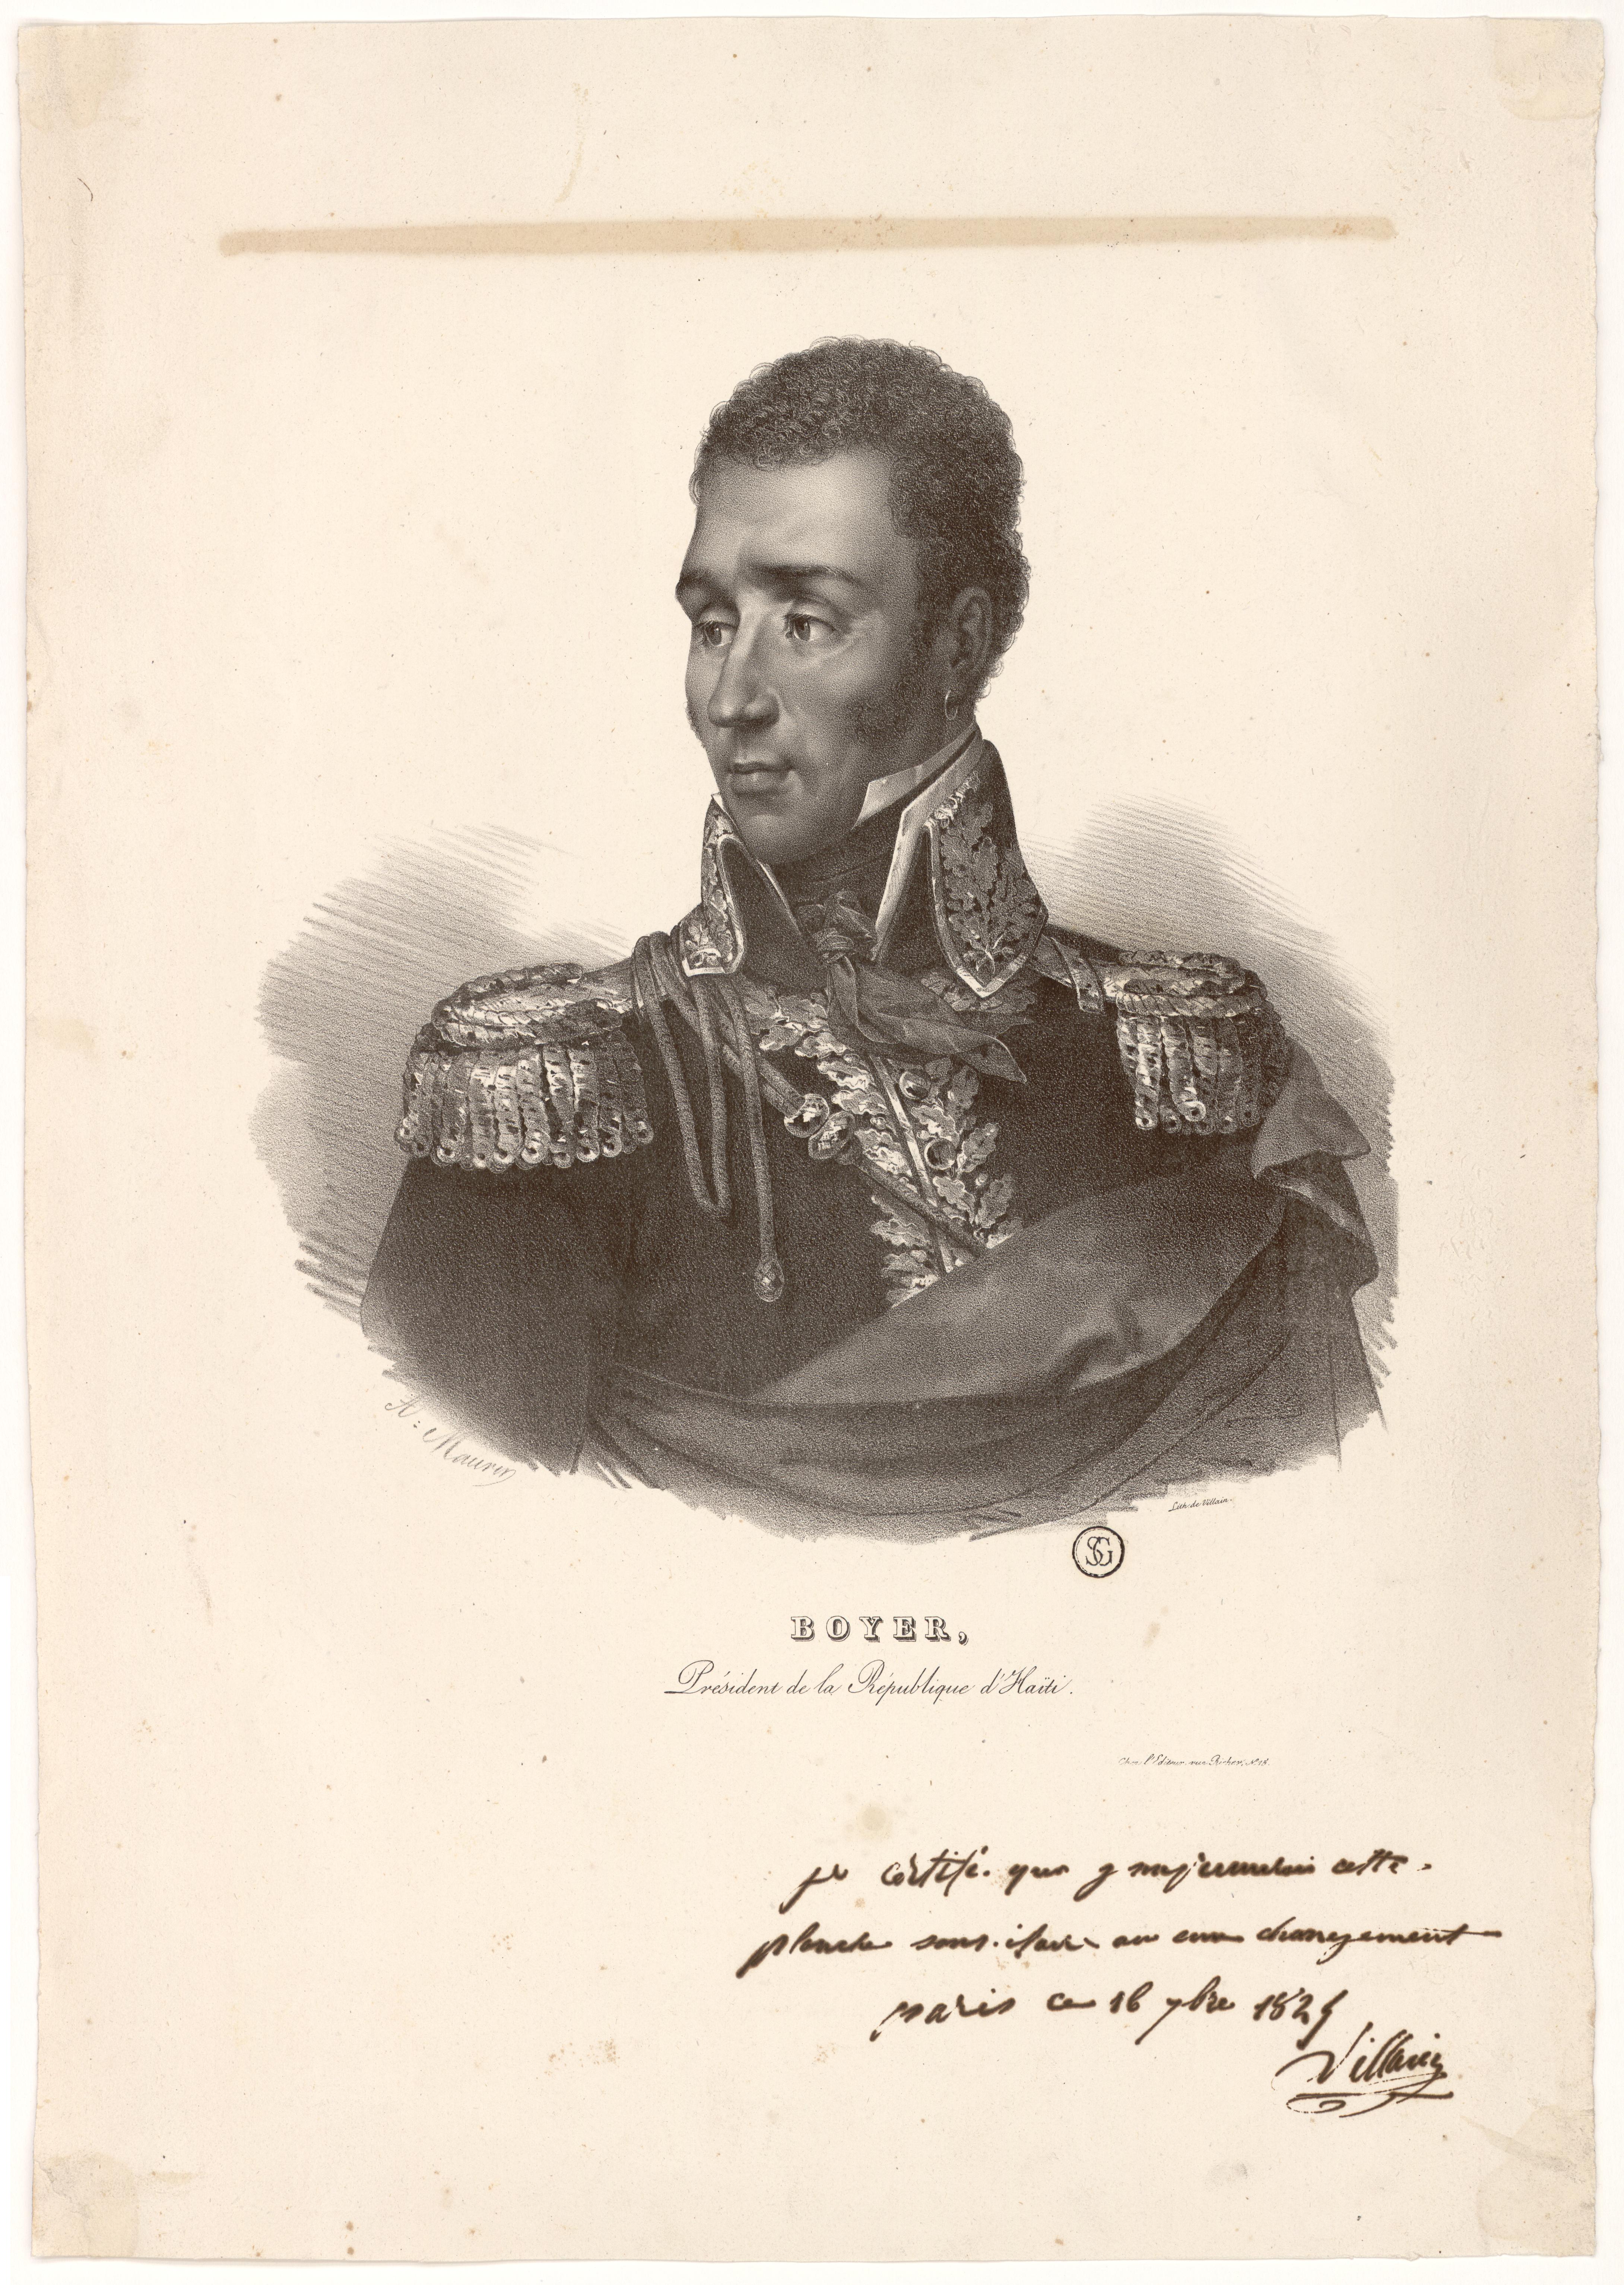 Portrait of Boyer in military uniform.